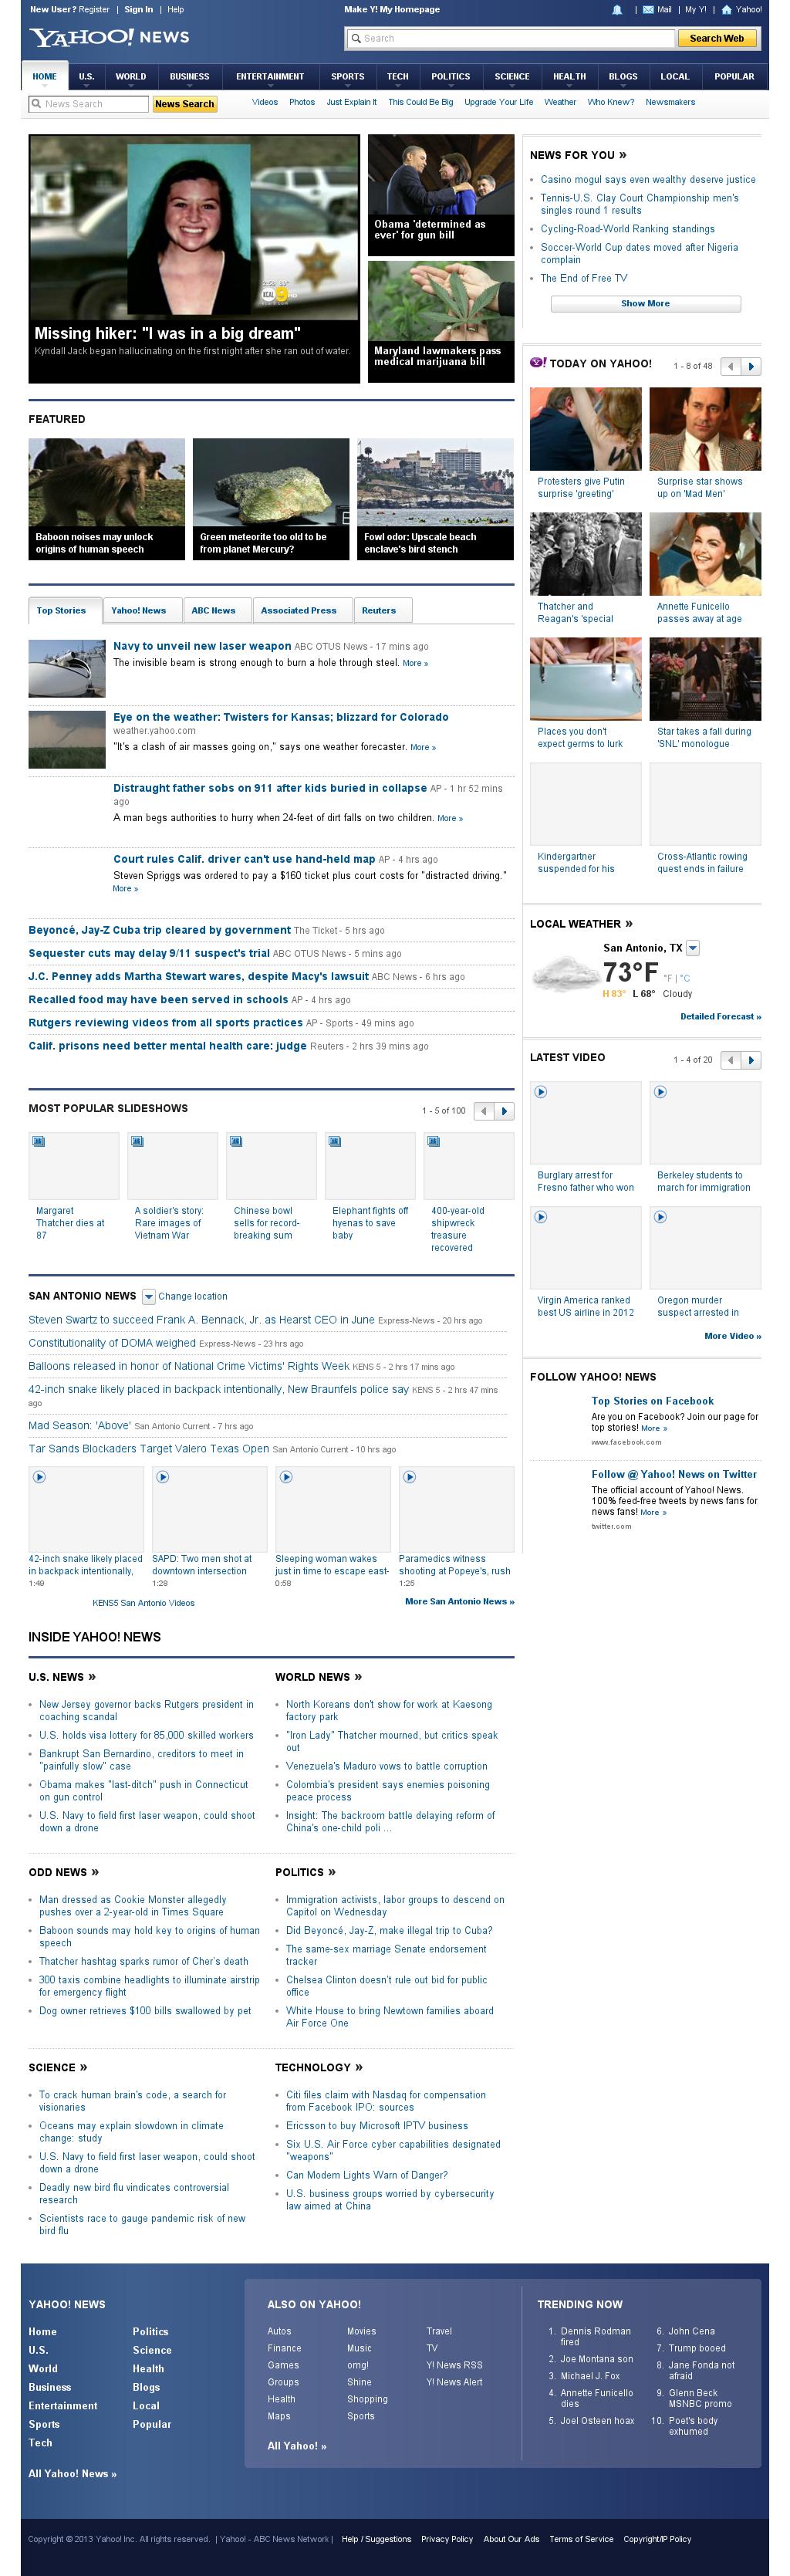 Yahoo! News at Tuesday April 9, 2013, 2:26 a.m. UTC